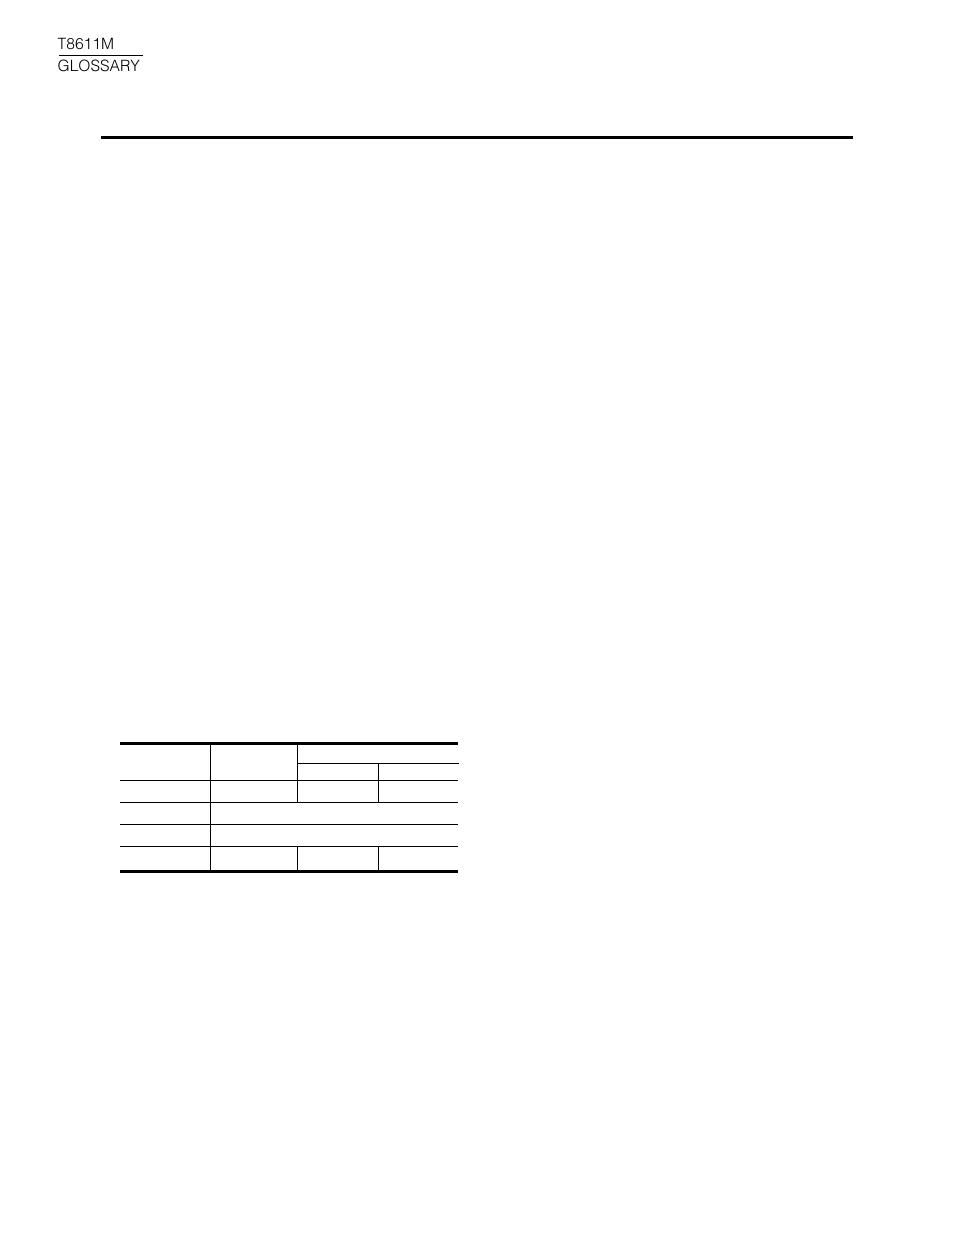 glossary honeywell chronotherm iii t8611m user manual page 30 rh manualsdir com Honeywell Chronotherm III AC Error Honeywell Chronotherm IV Plus